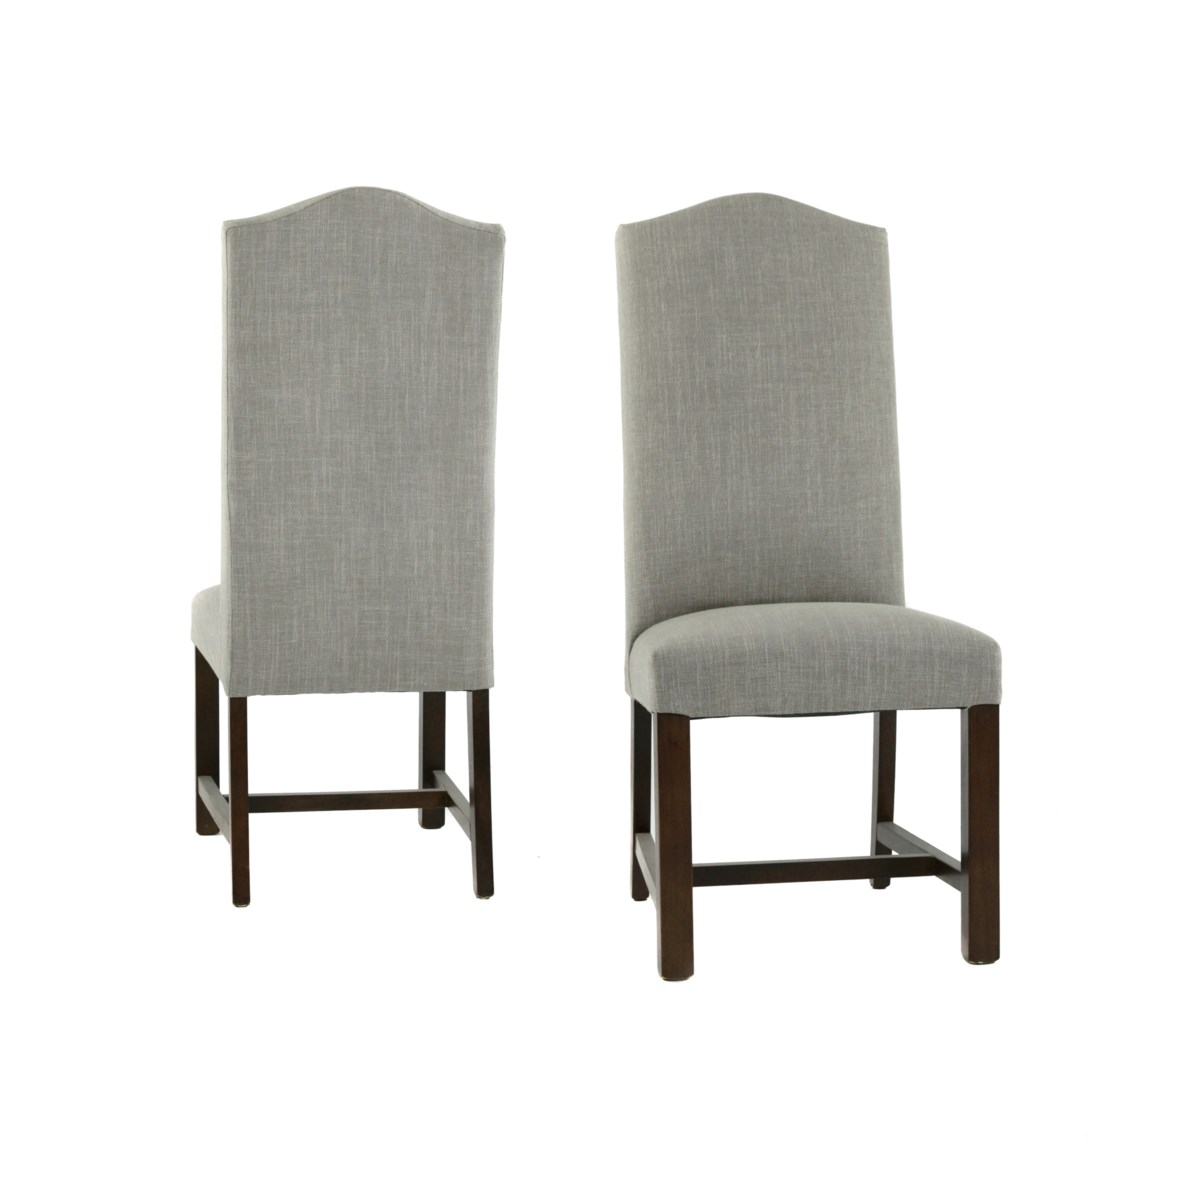 Sharon Chair Linen Clay / P110 Brown